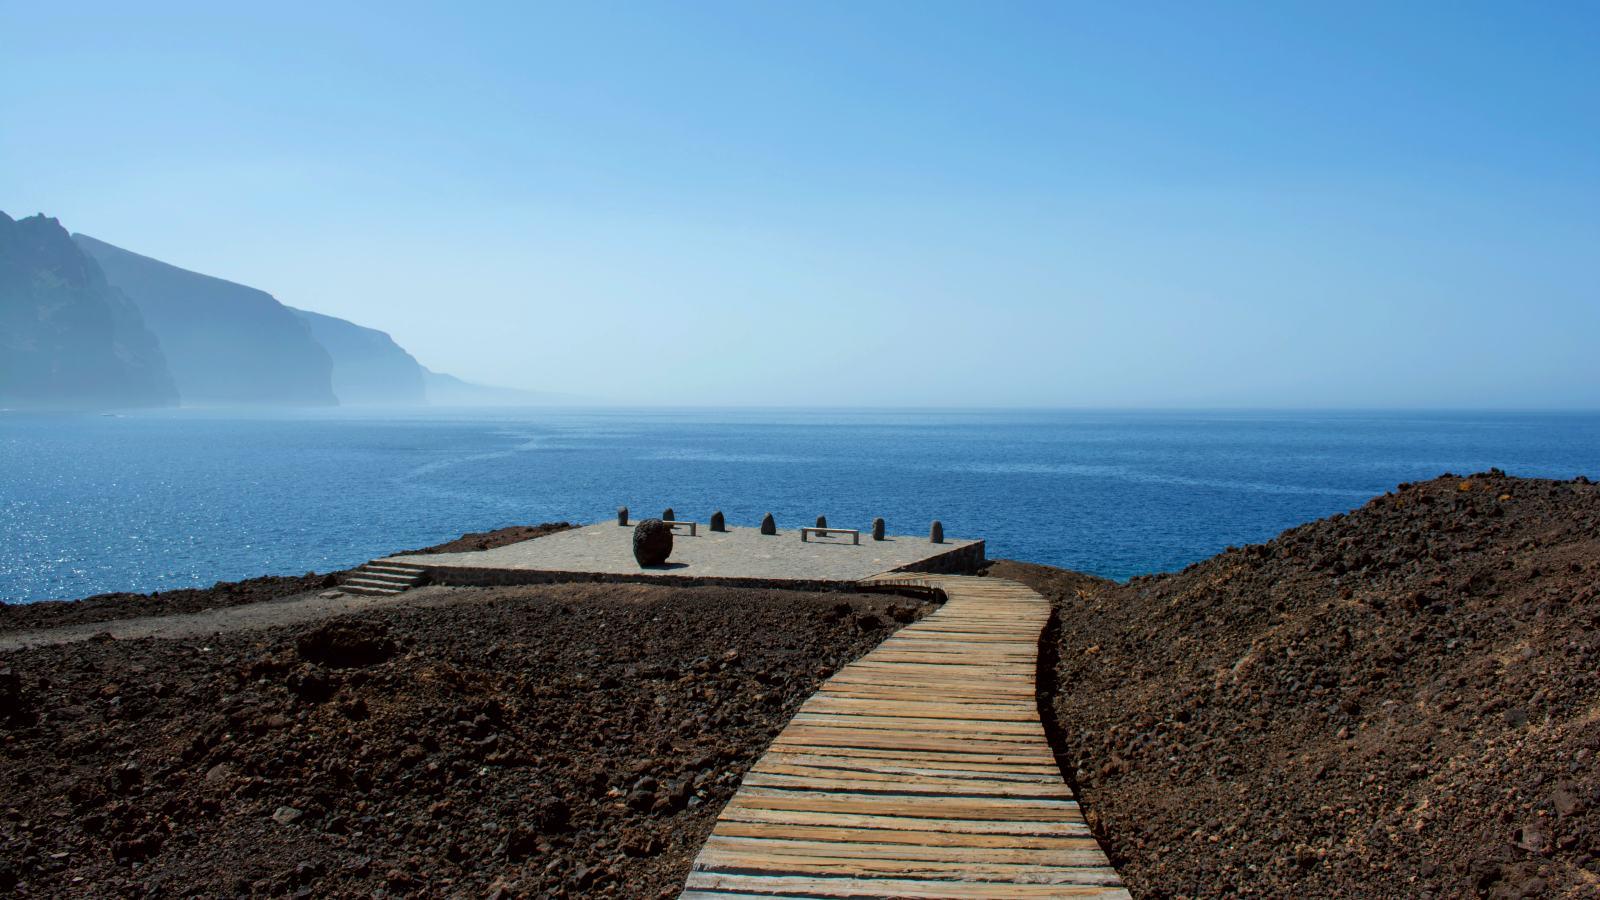 Pasarela de madera al faro de Punta de Teno